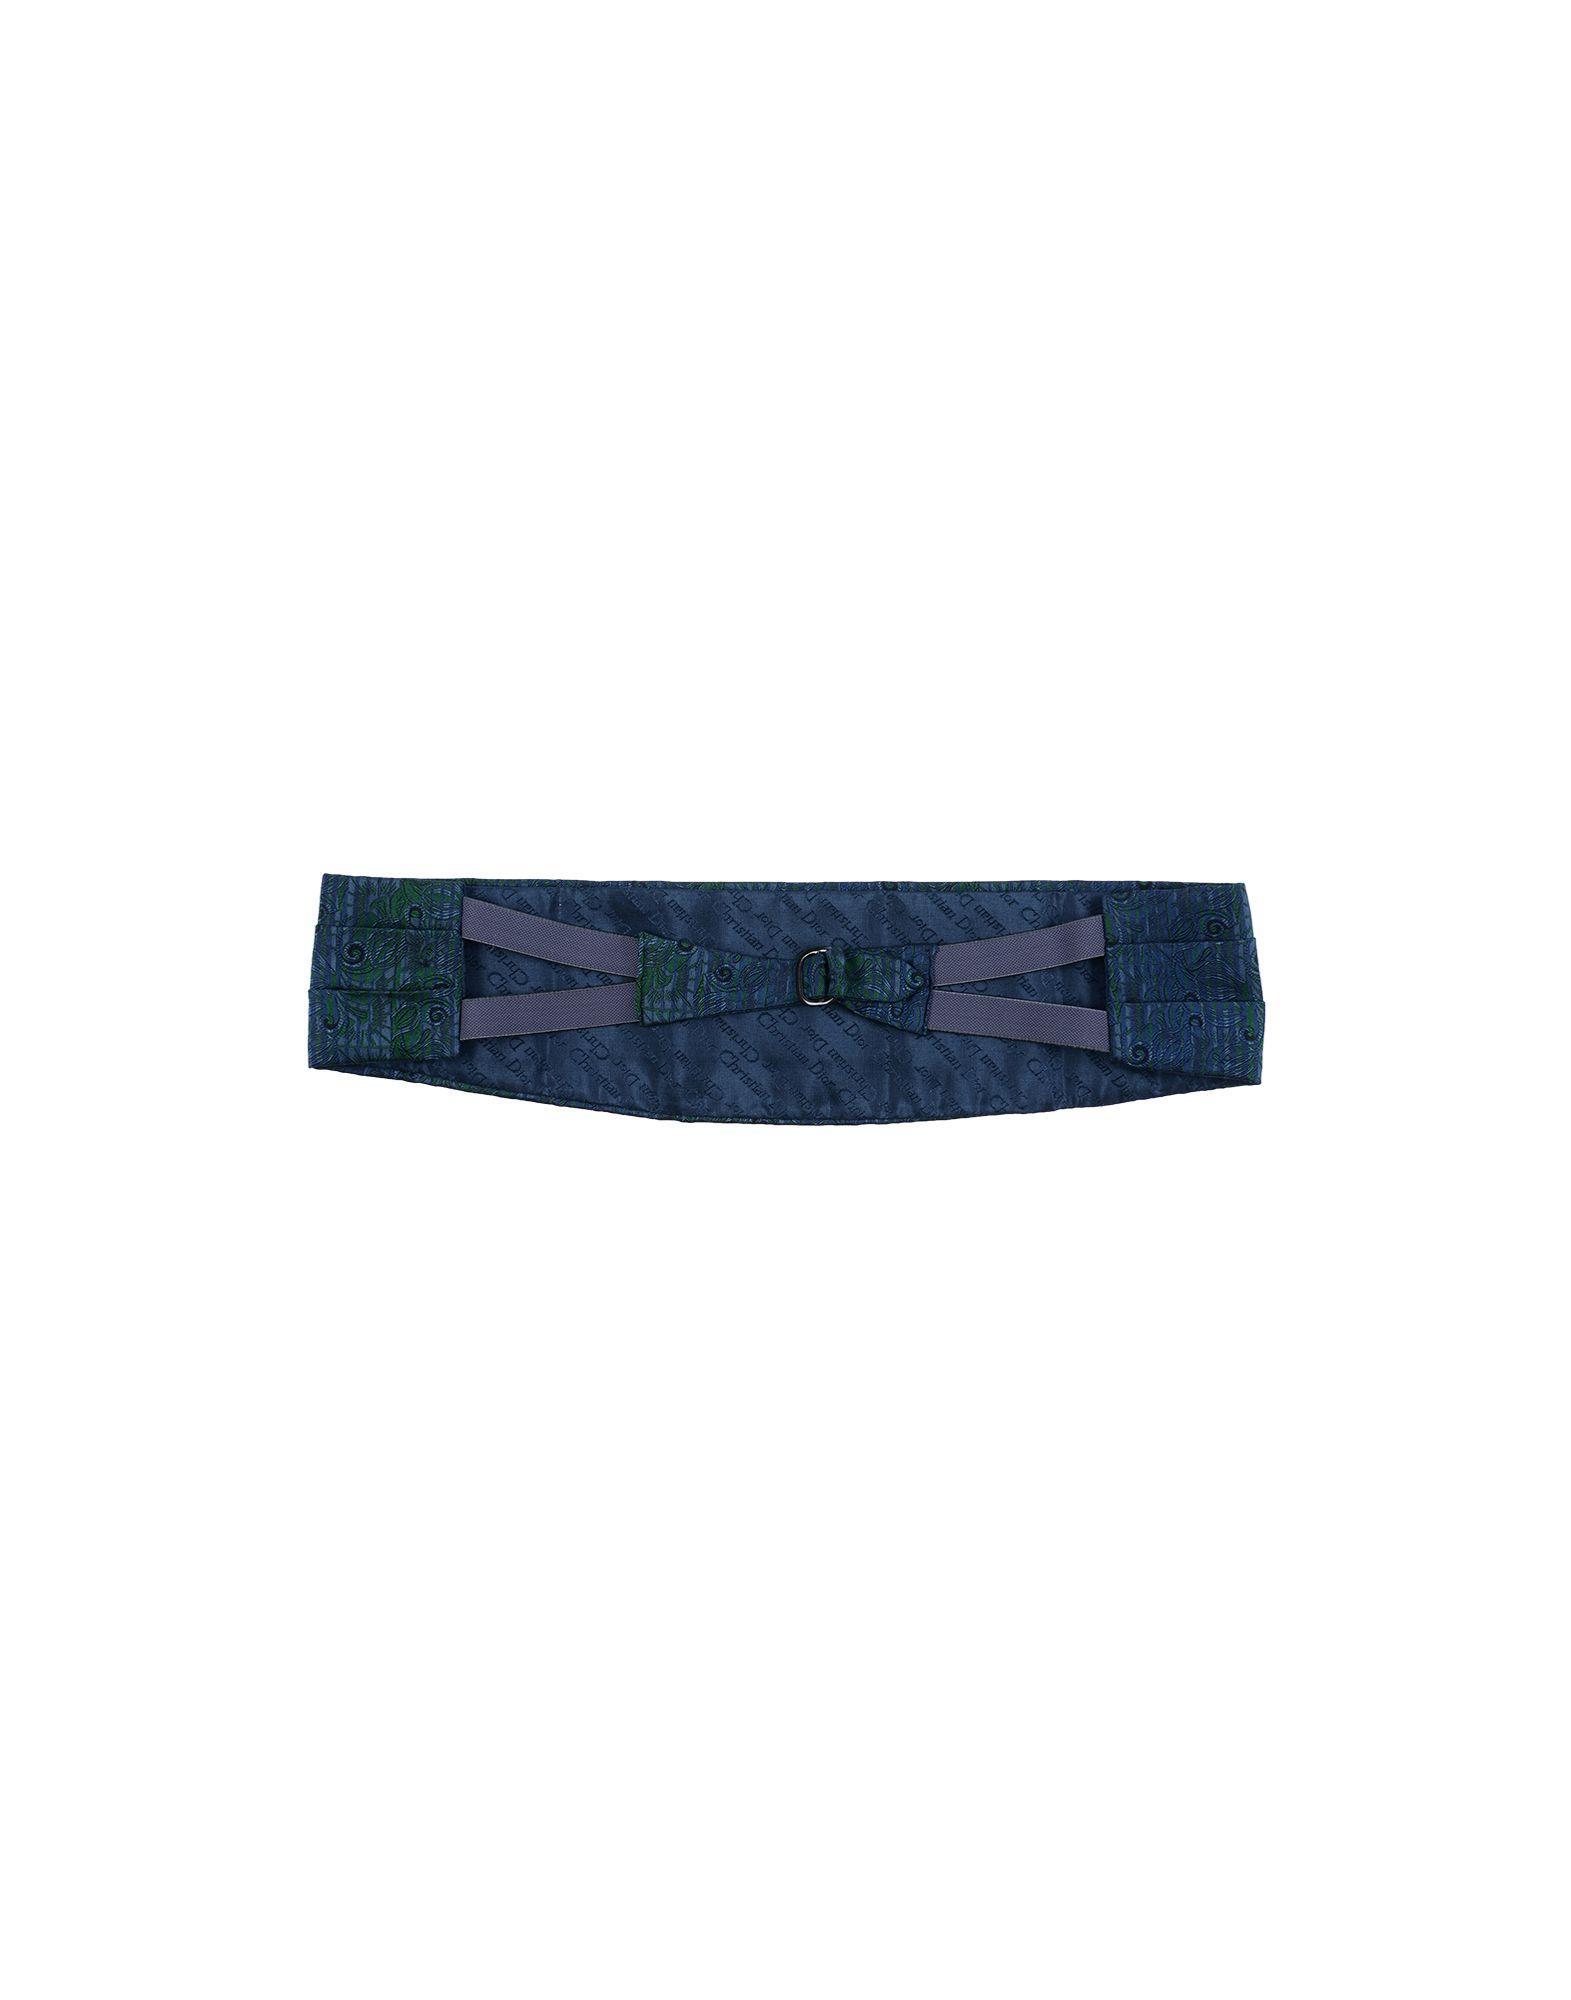 64c61cabc9889 Lyst - Dior Homme Belt in Blue for Men